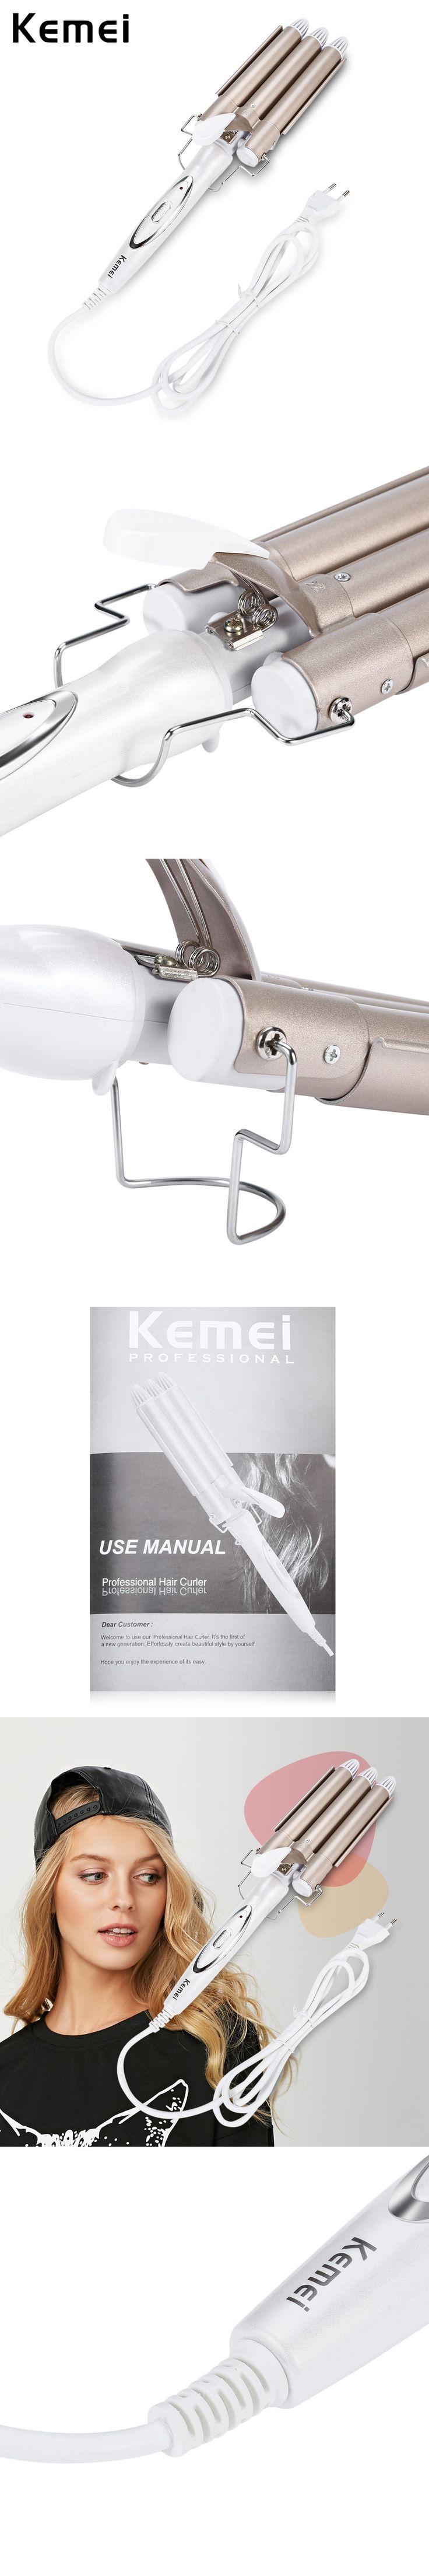 KEMEI High Quality Pro 110-220V Hair Curling Iron Ceramic Triple Barrel Hair Curler Hair Waver Styling Tools Hair Styler